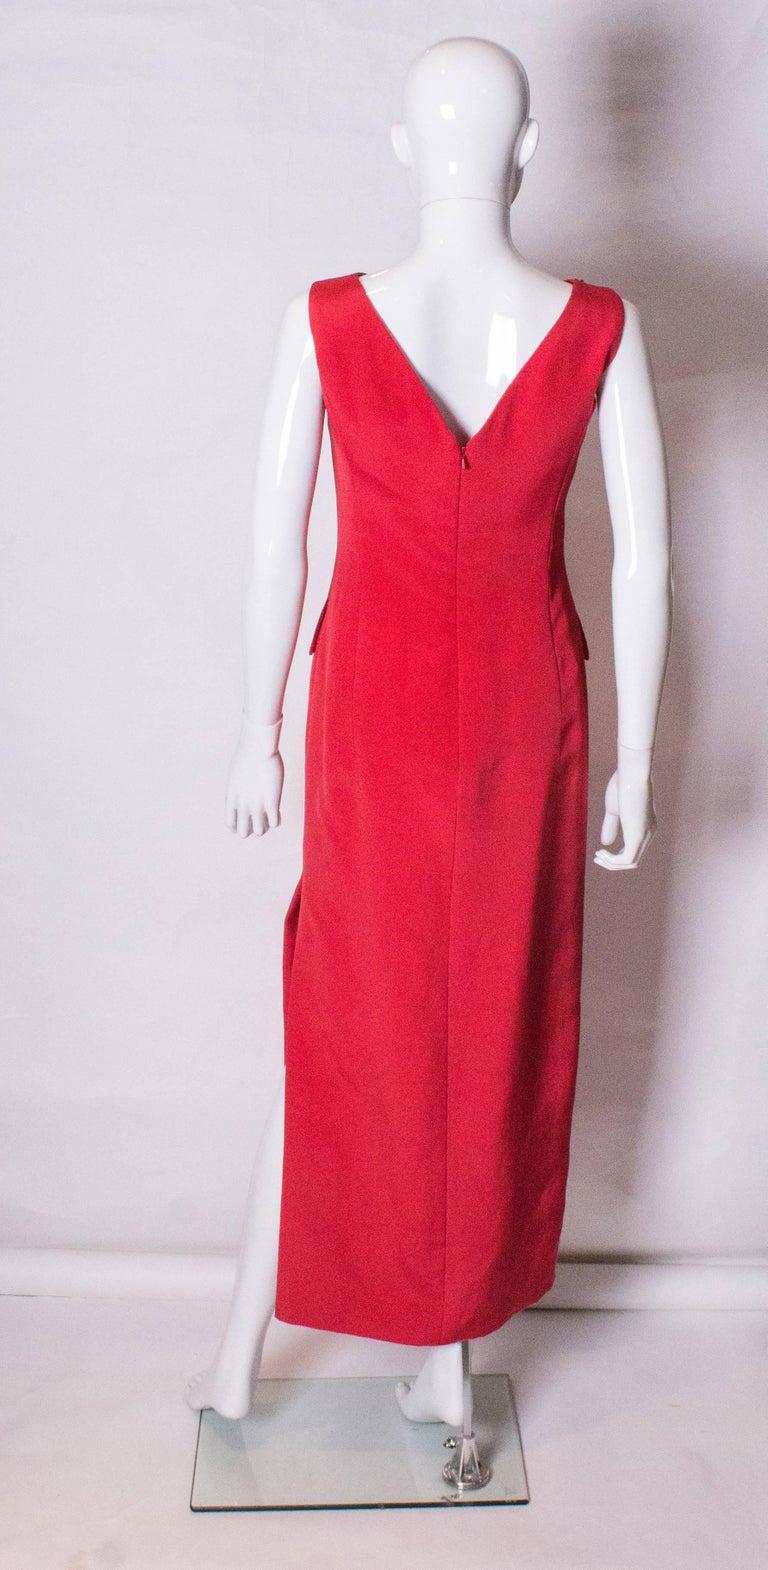 Women's Vintage Red Tomasz Starzewski Evening Gown For Sale